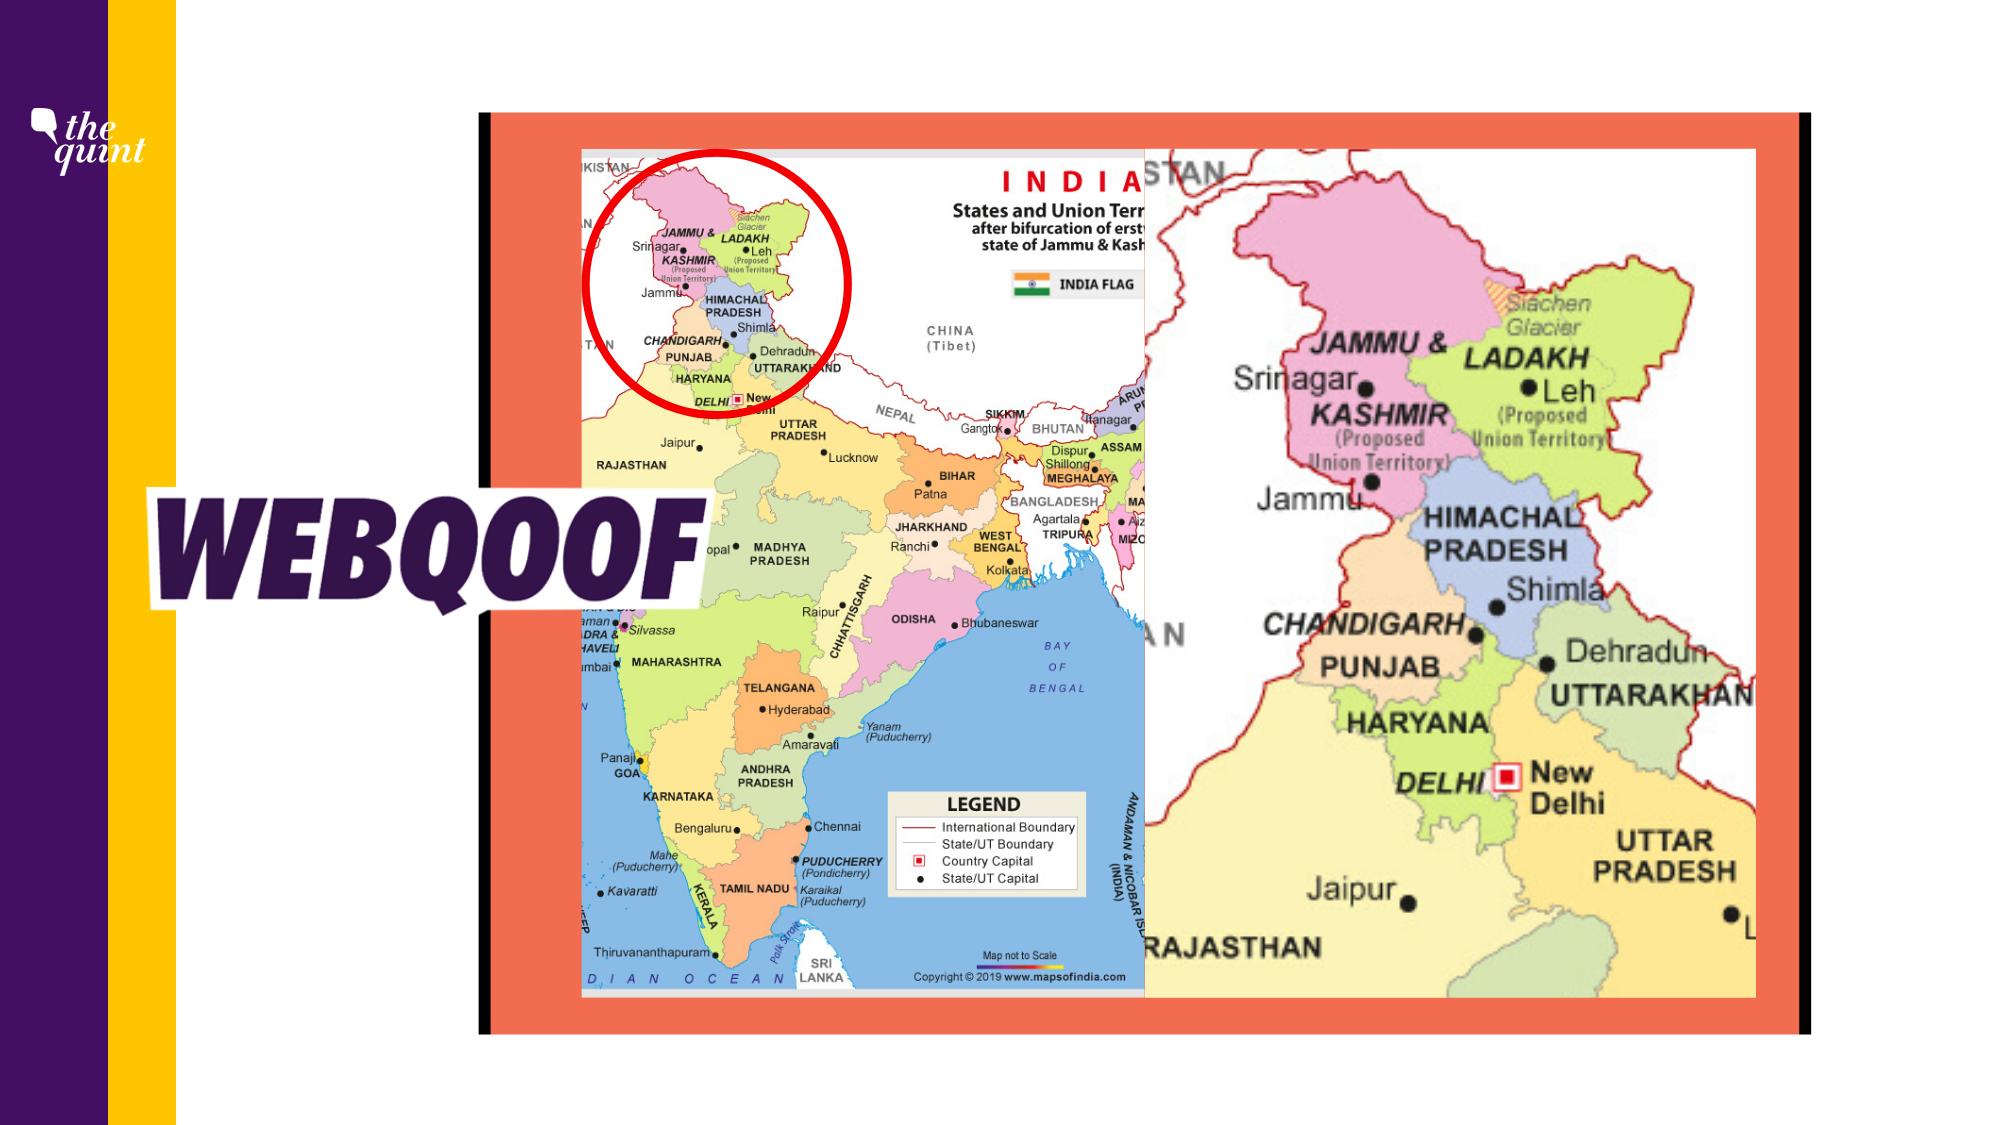 Viral Photo of Map of India Shows Wrong Boundaries of J&K, Ladakh